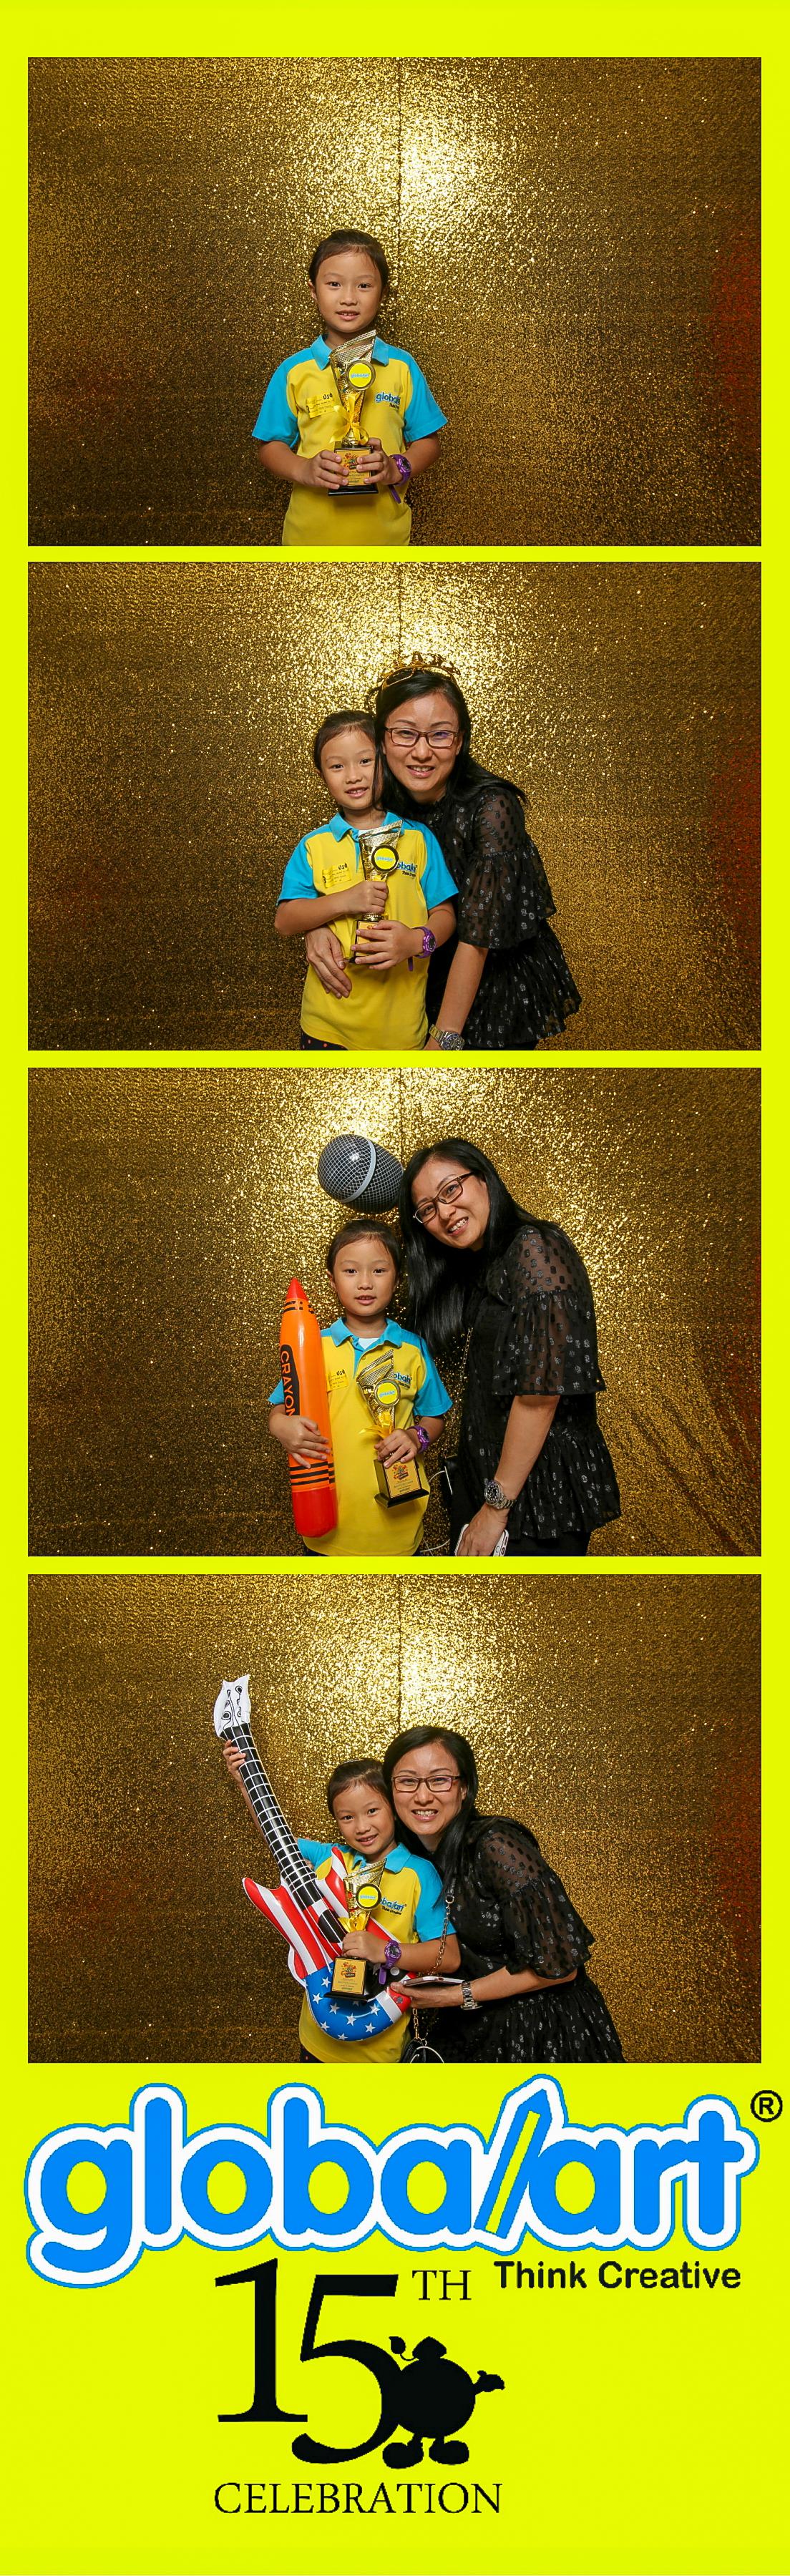 global art photo booth singapore (28)